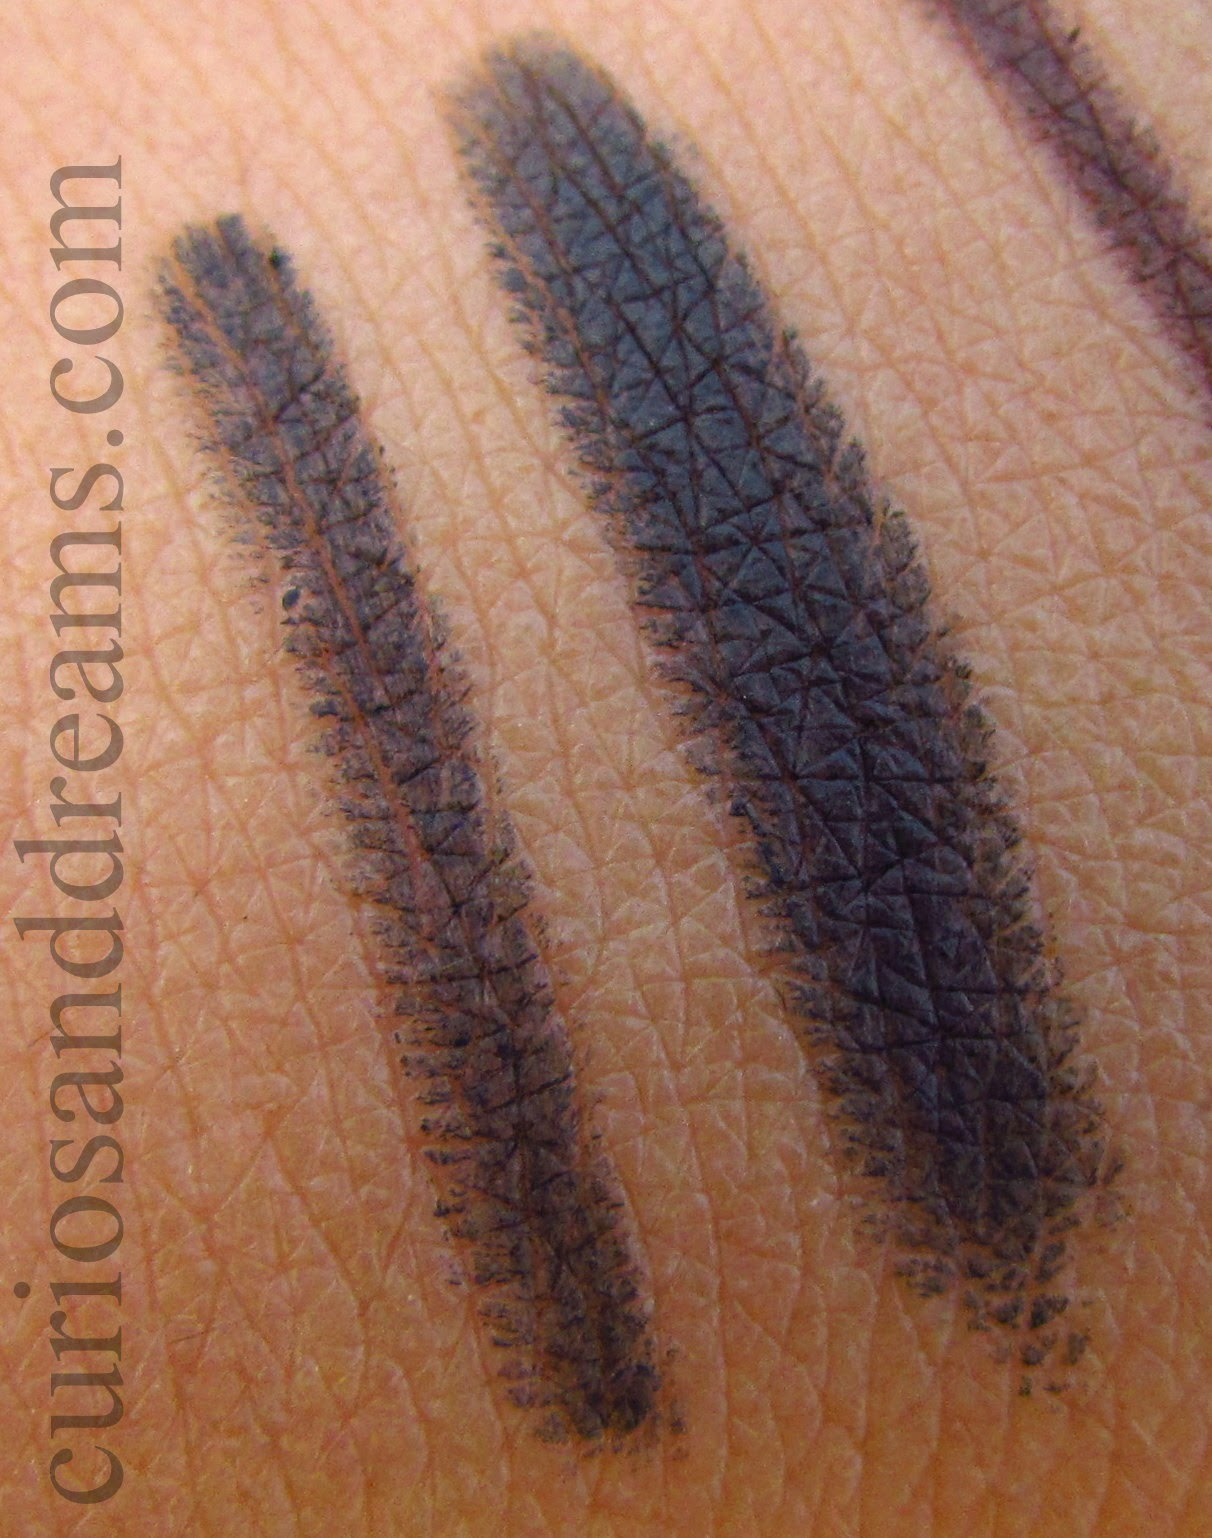 lakme eyeconic kajal review, lakme eyeconic kajal black, lakme eyeconic kajal brown,